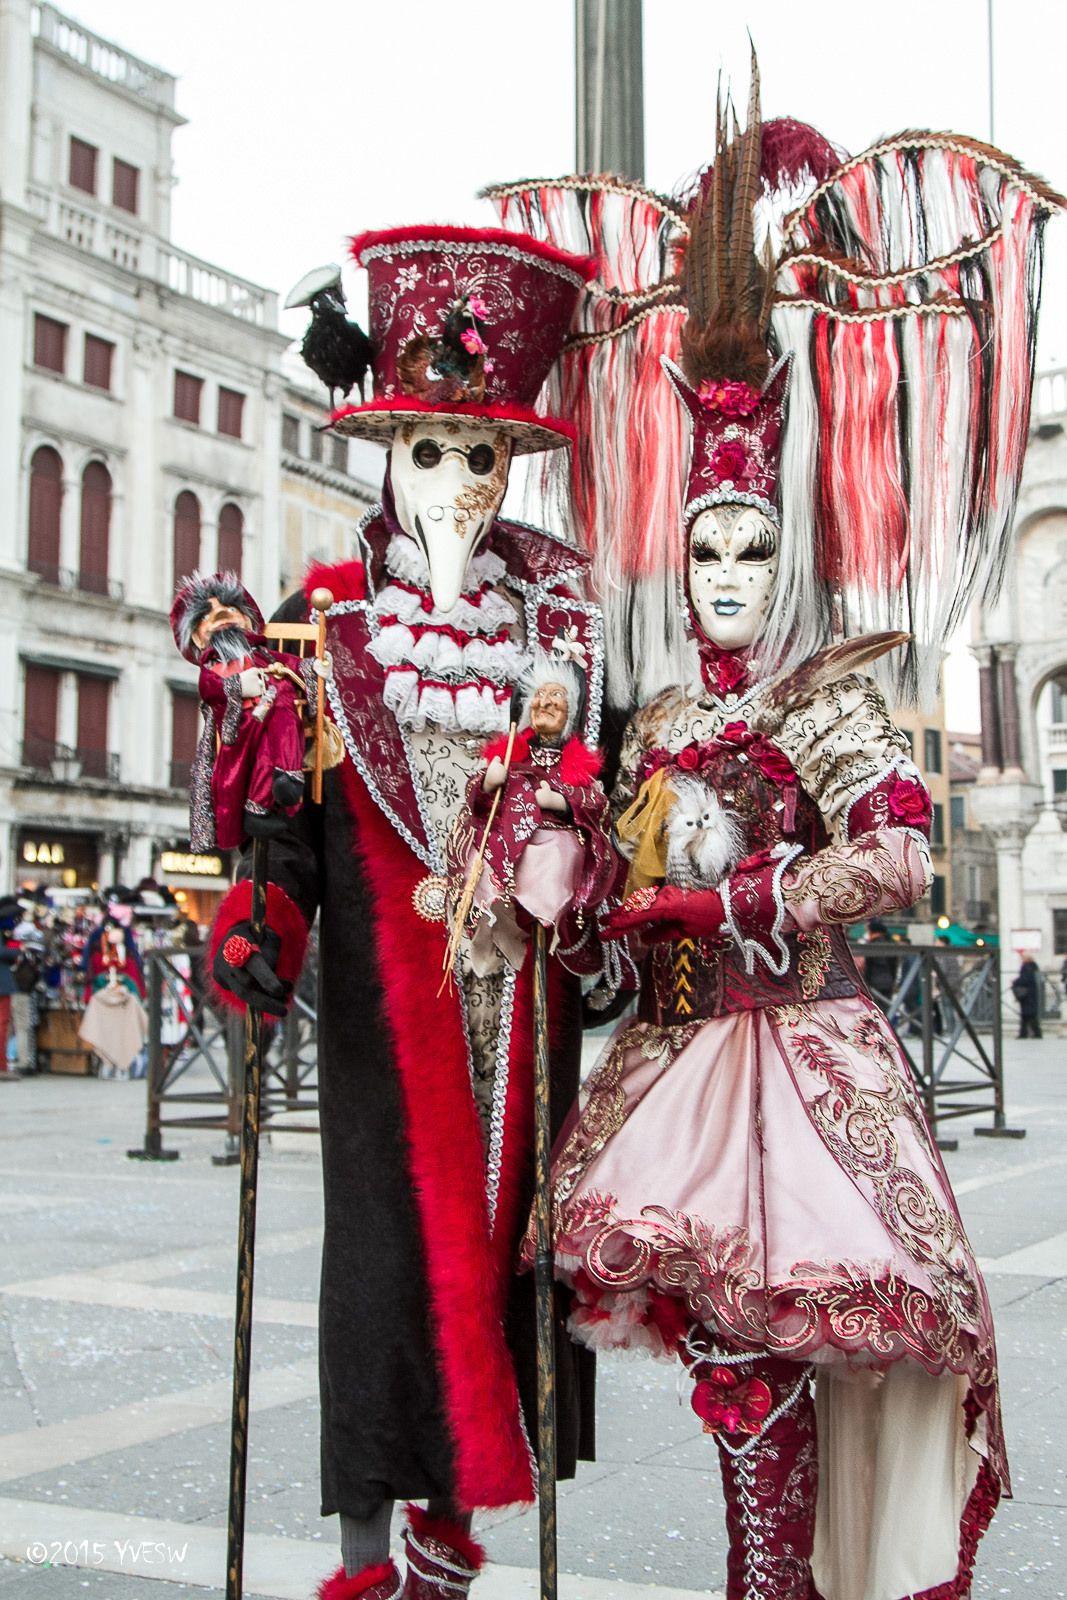 Carnaval De Venise 2015 16579 Venice Carnival Costumes Masquerade Costumes Carnival Of Venice